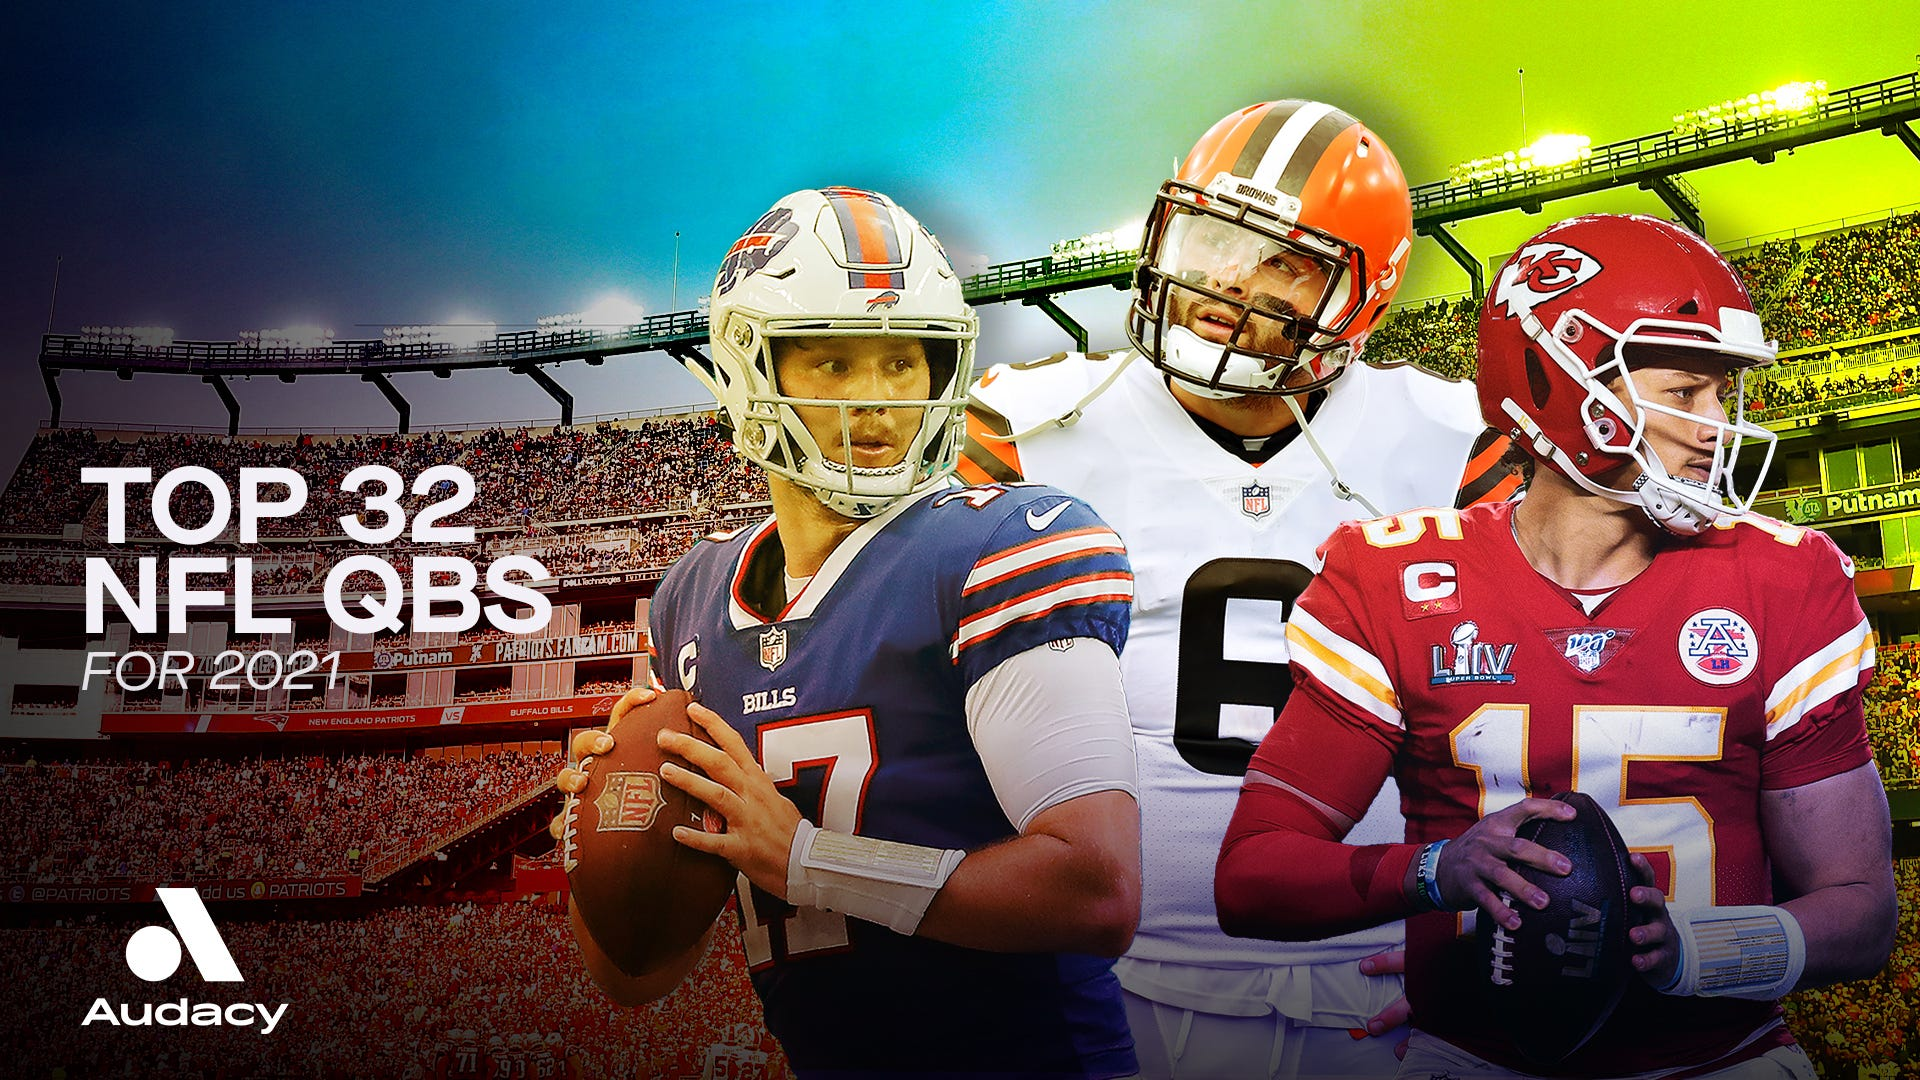 Top 32 NFL quarterbacks for 2021 season, ranked